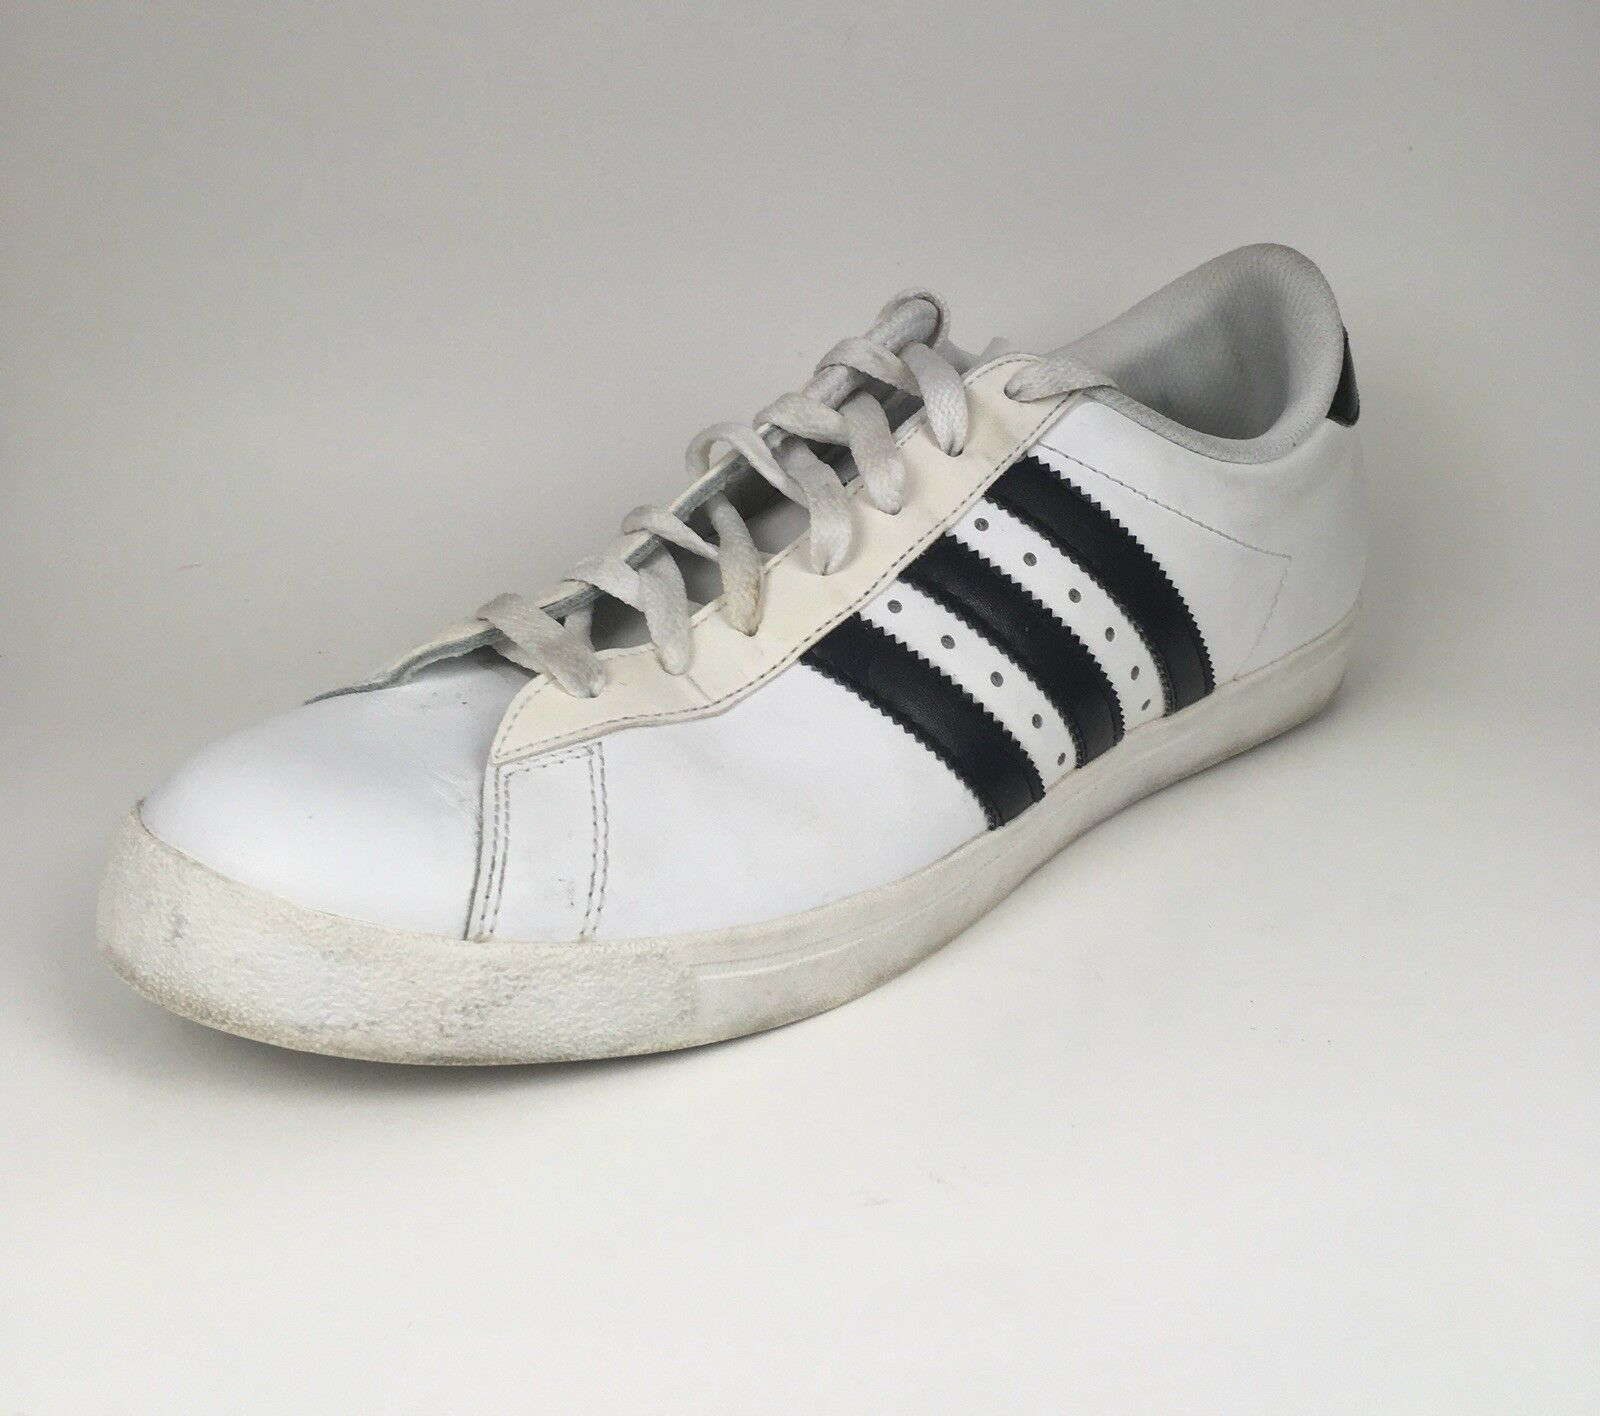 on sale b3e6f e7236 Adidas Hombre VerdeStar blanco blanco blanco   negro zapatos g96286 cómodos zapatos  nuevos para hombres y